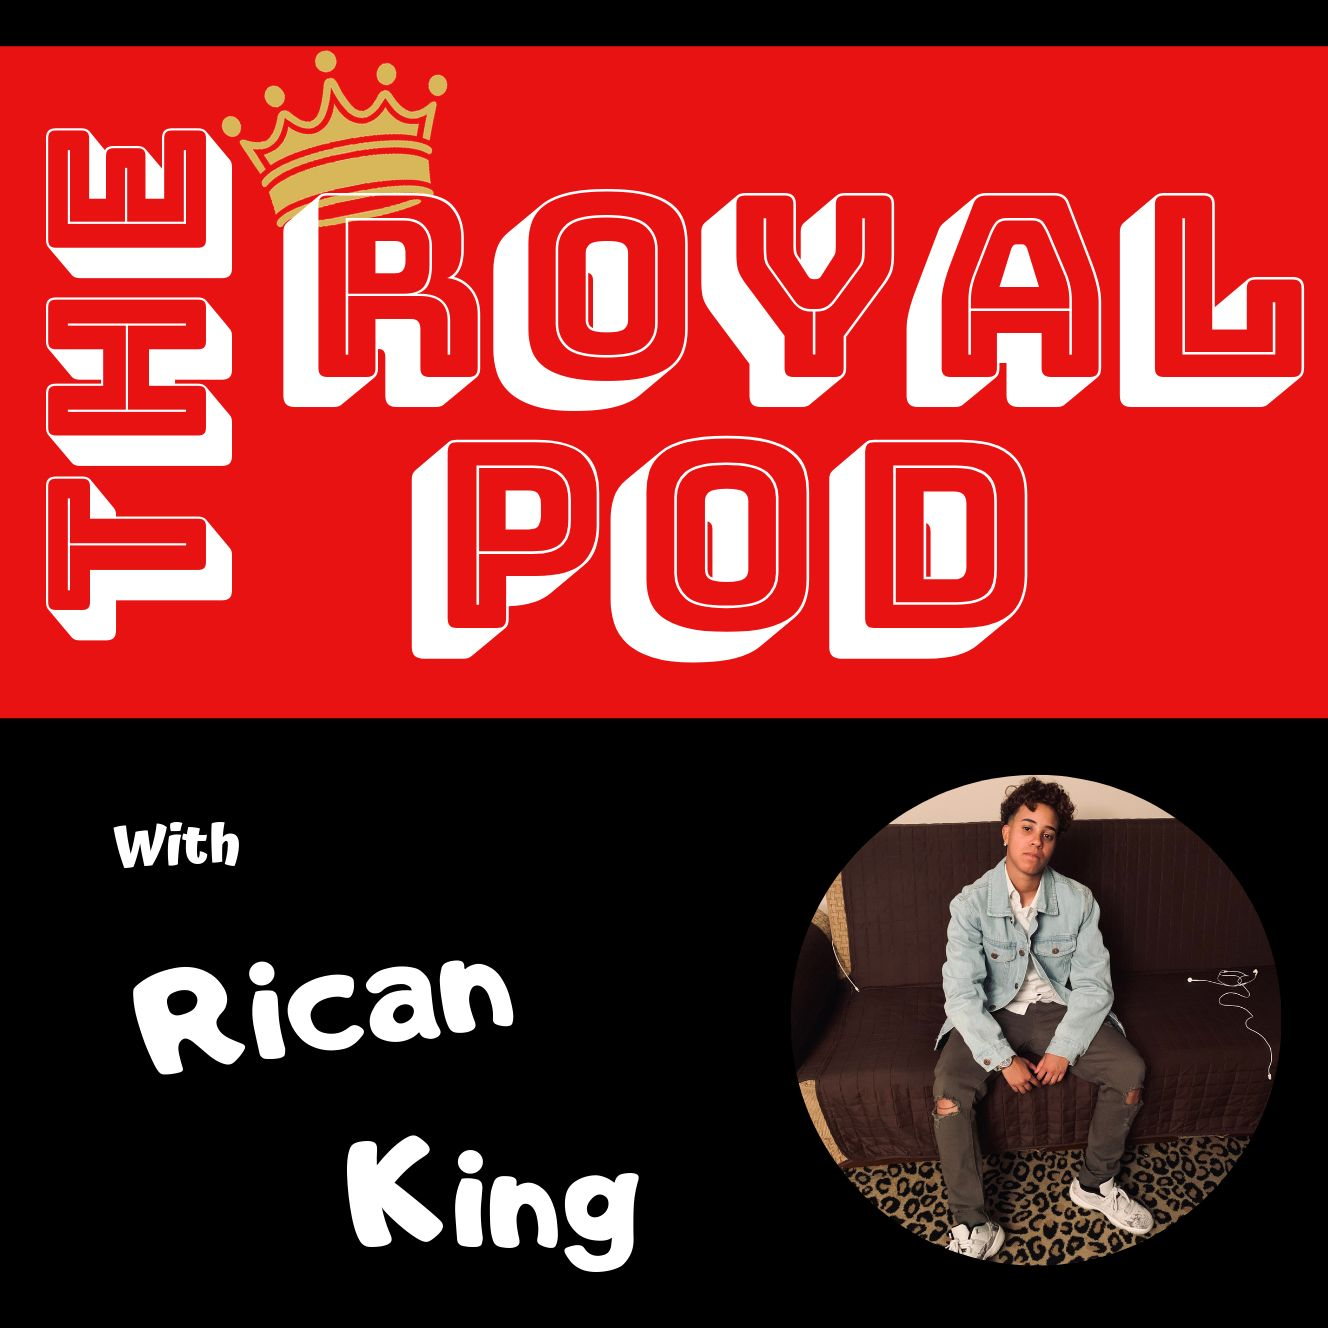 The Royal Pod